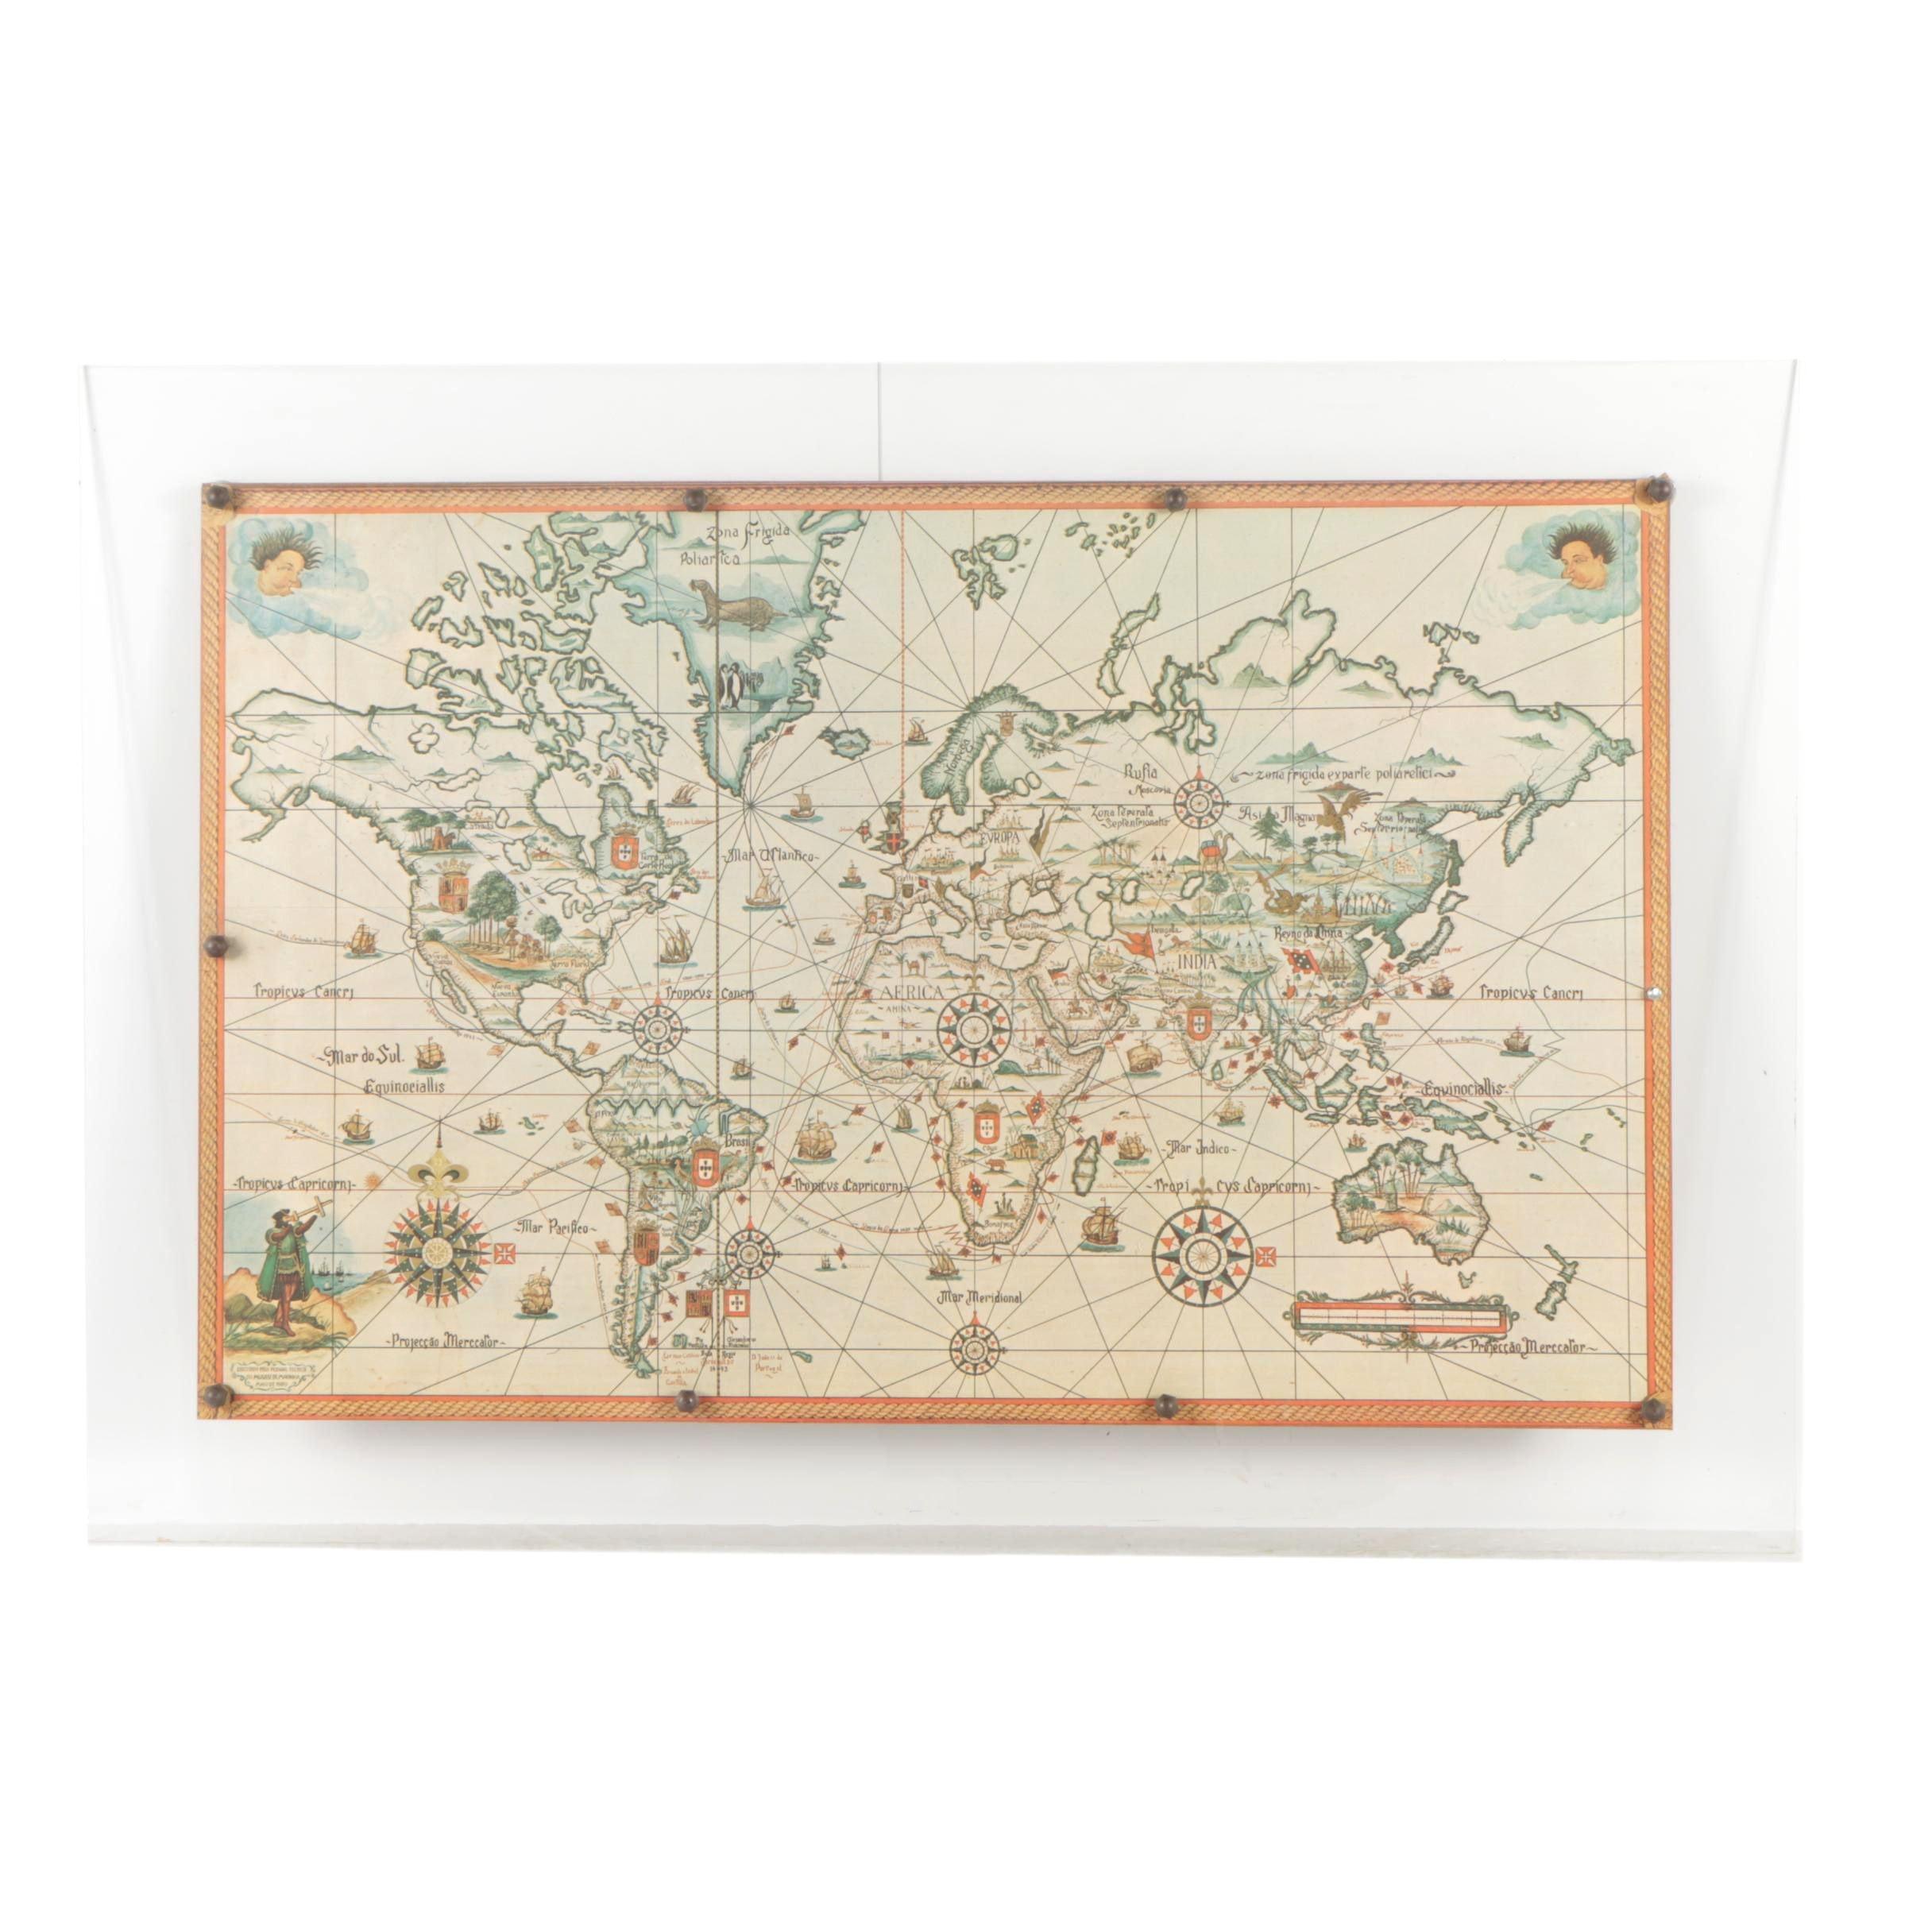 Vintage Offset Lithograph of a Portuguese Language Nautical Map